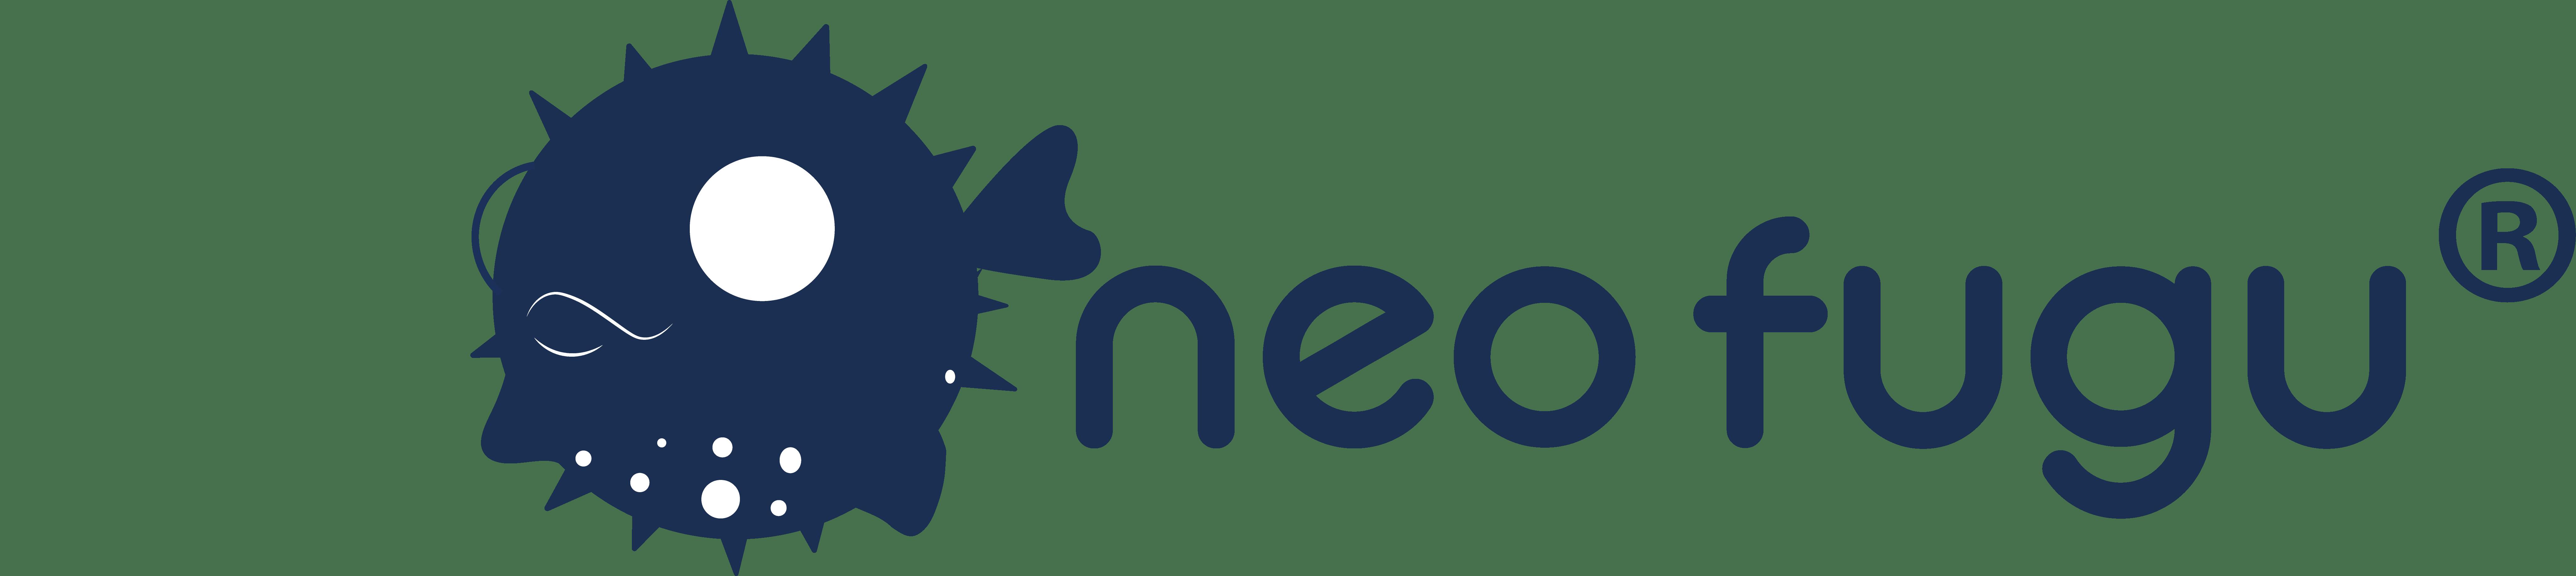 NEO-FUGU logiciel joaillerie HBJO